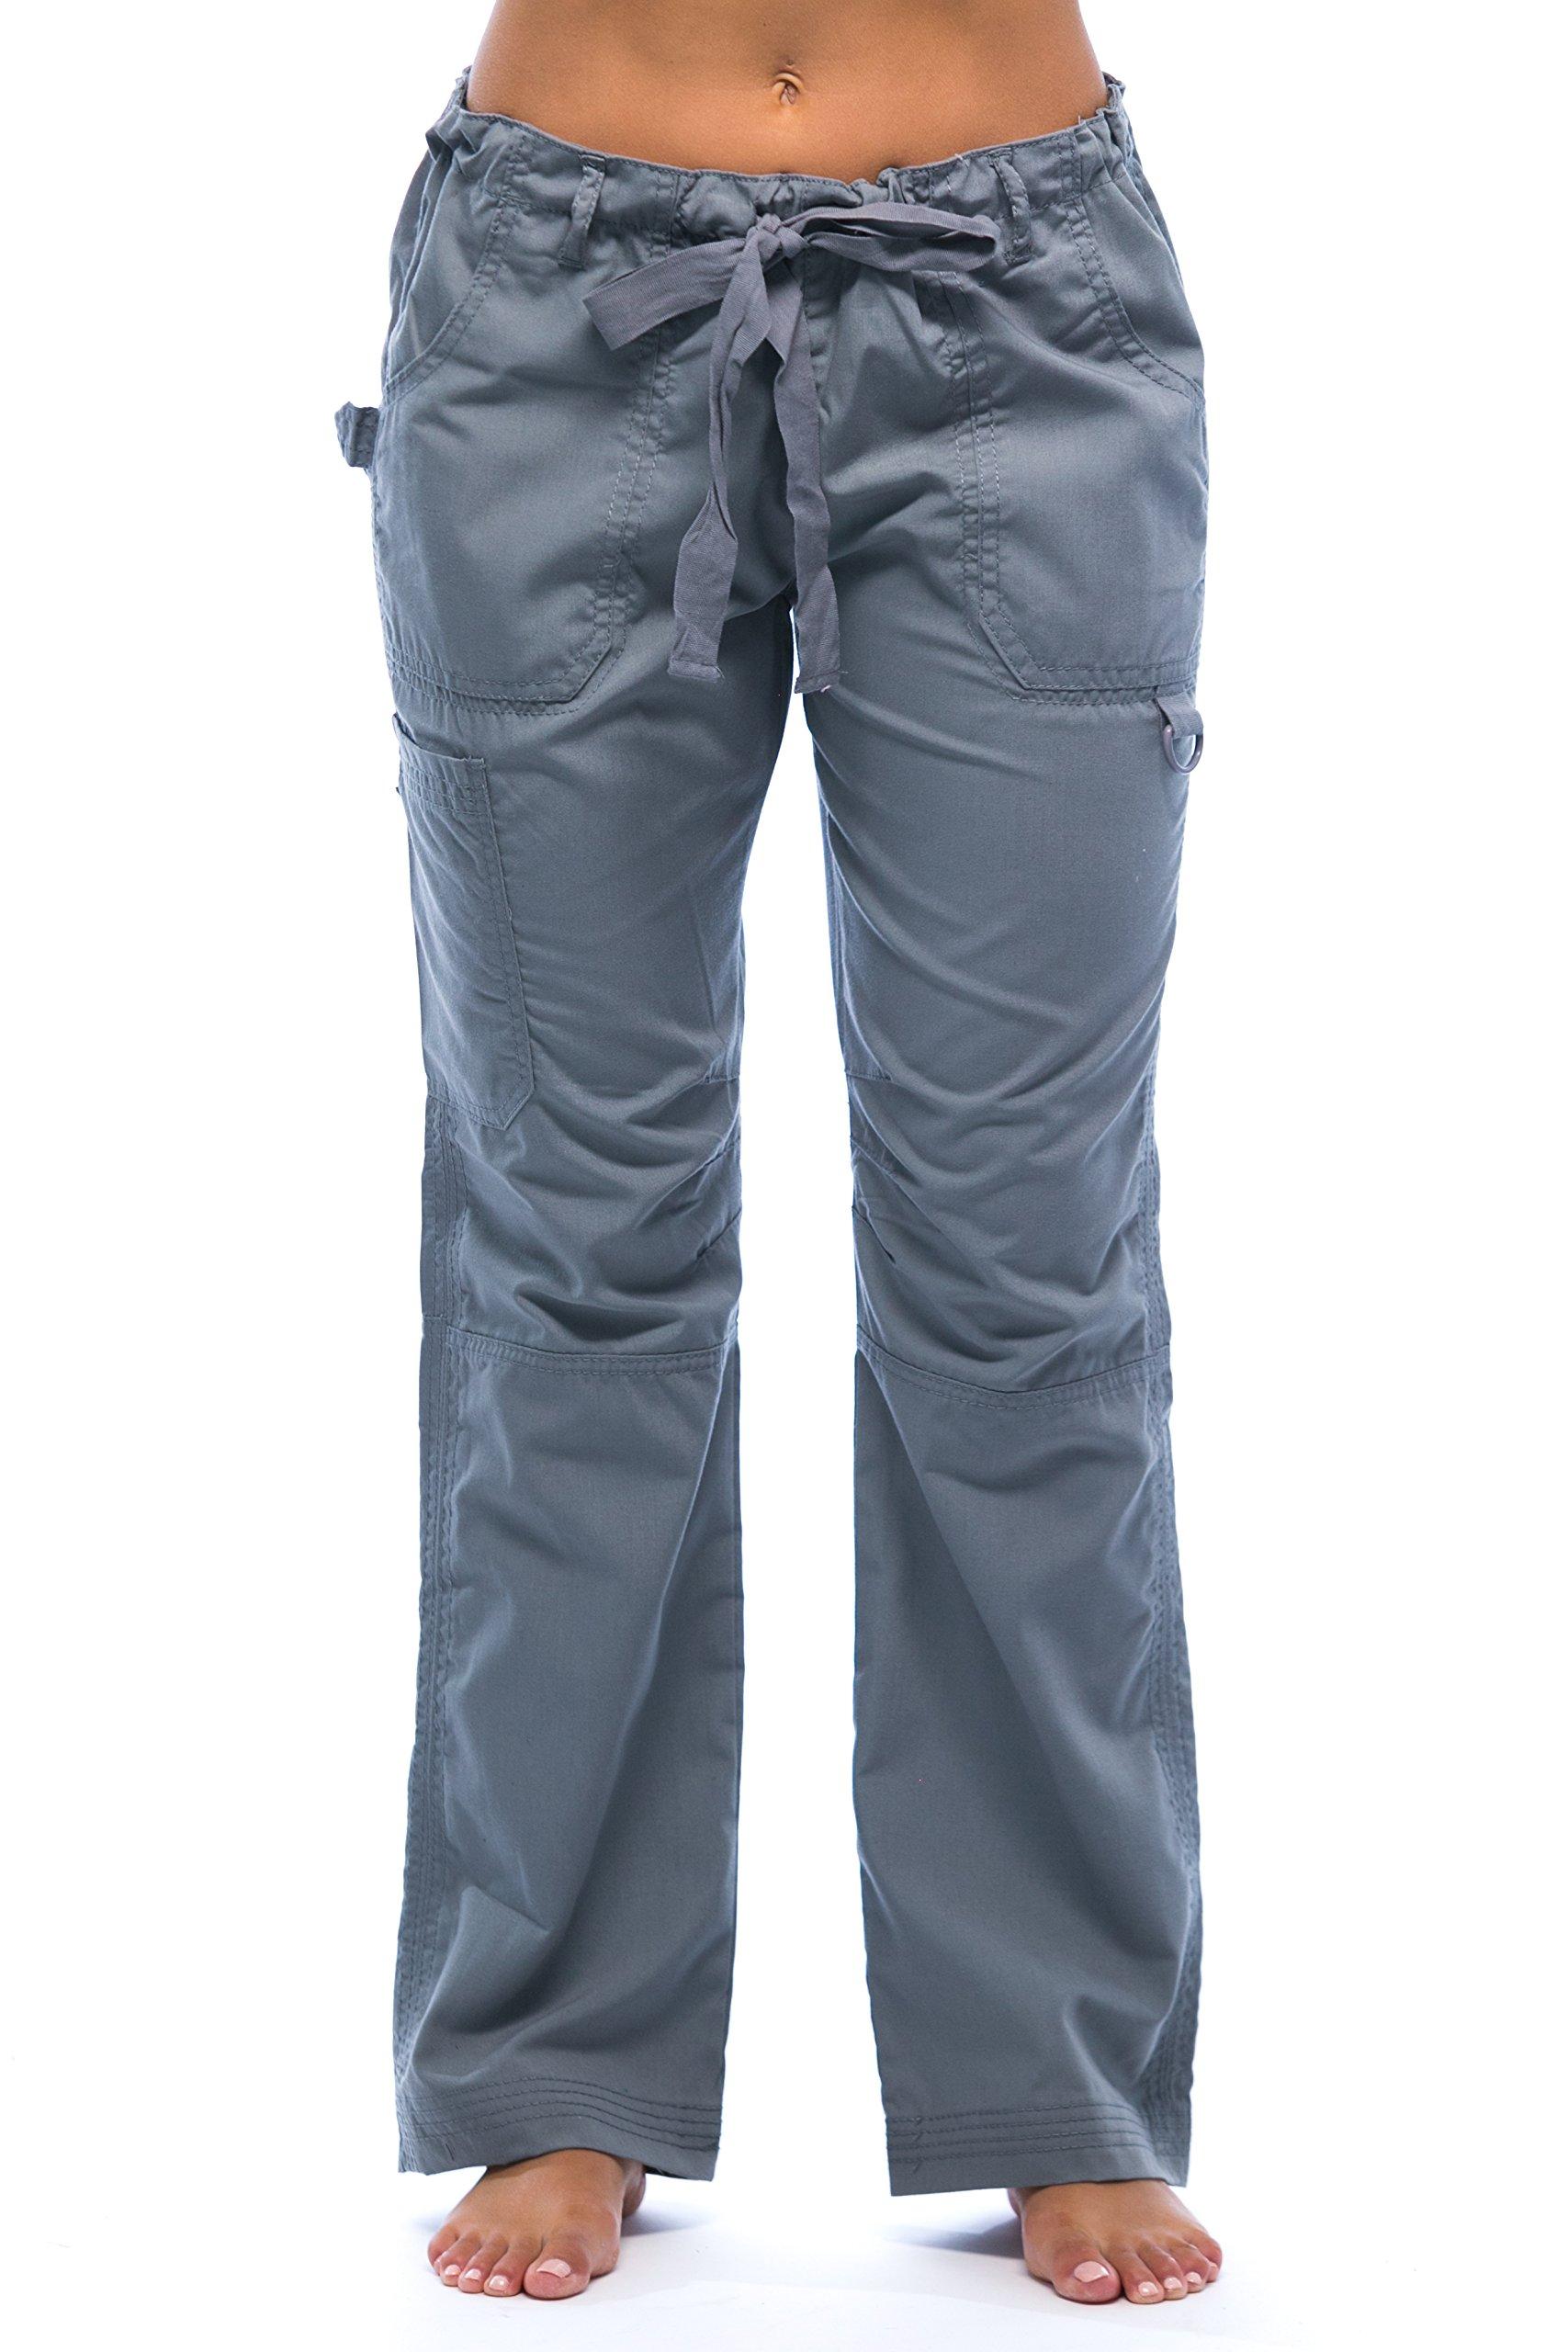 24000PLTGRY-L Just Love Women's Utility Scrub Pants / Scrubs, Light Grey Utility, Large